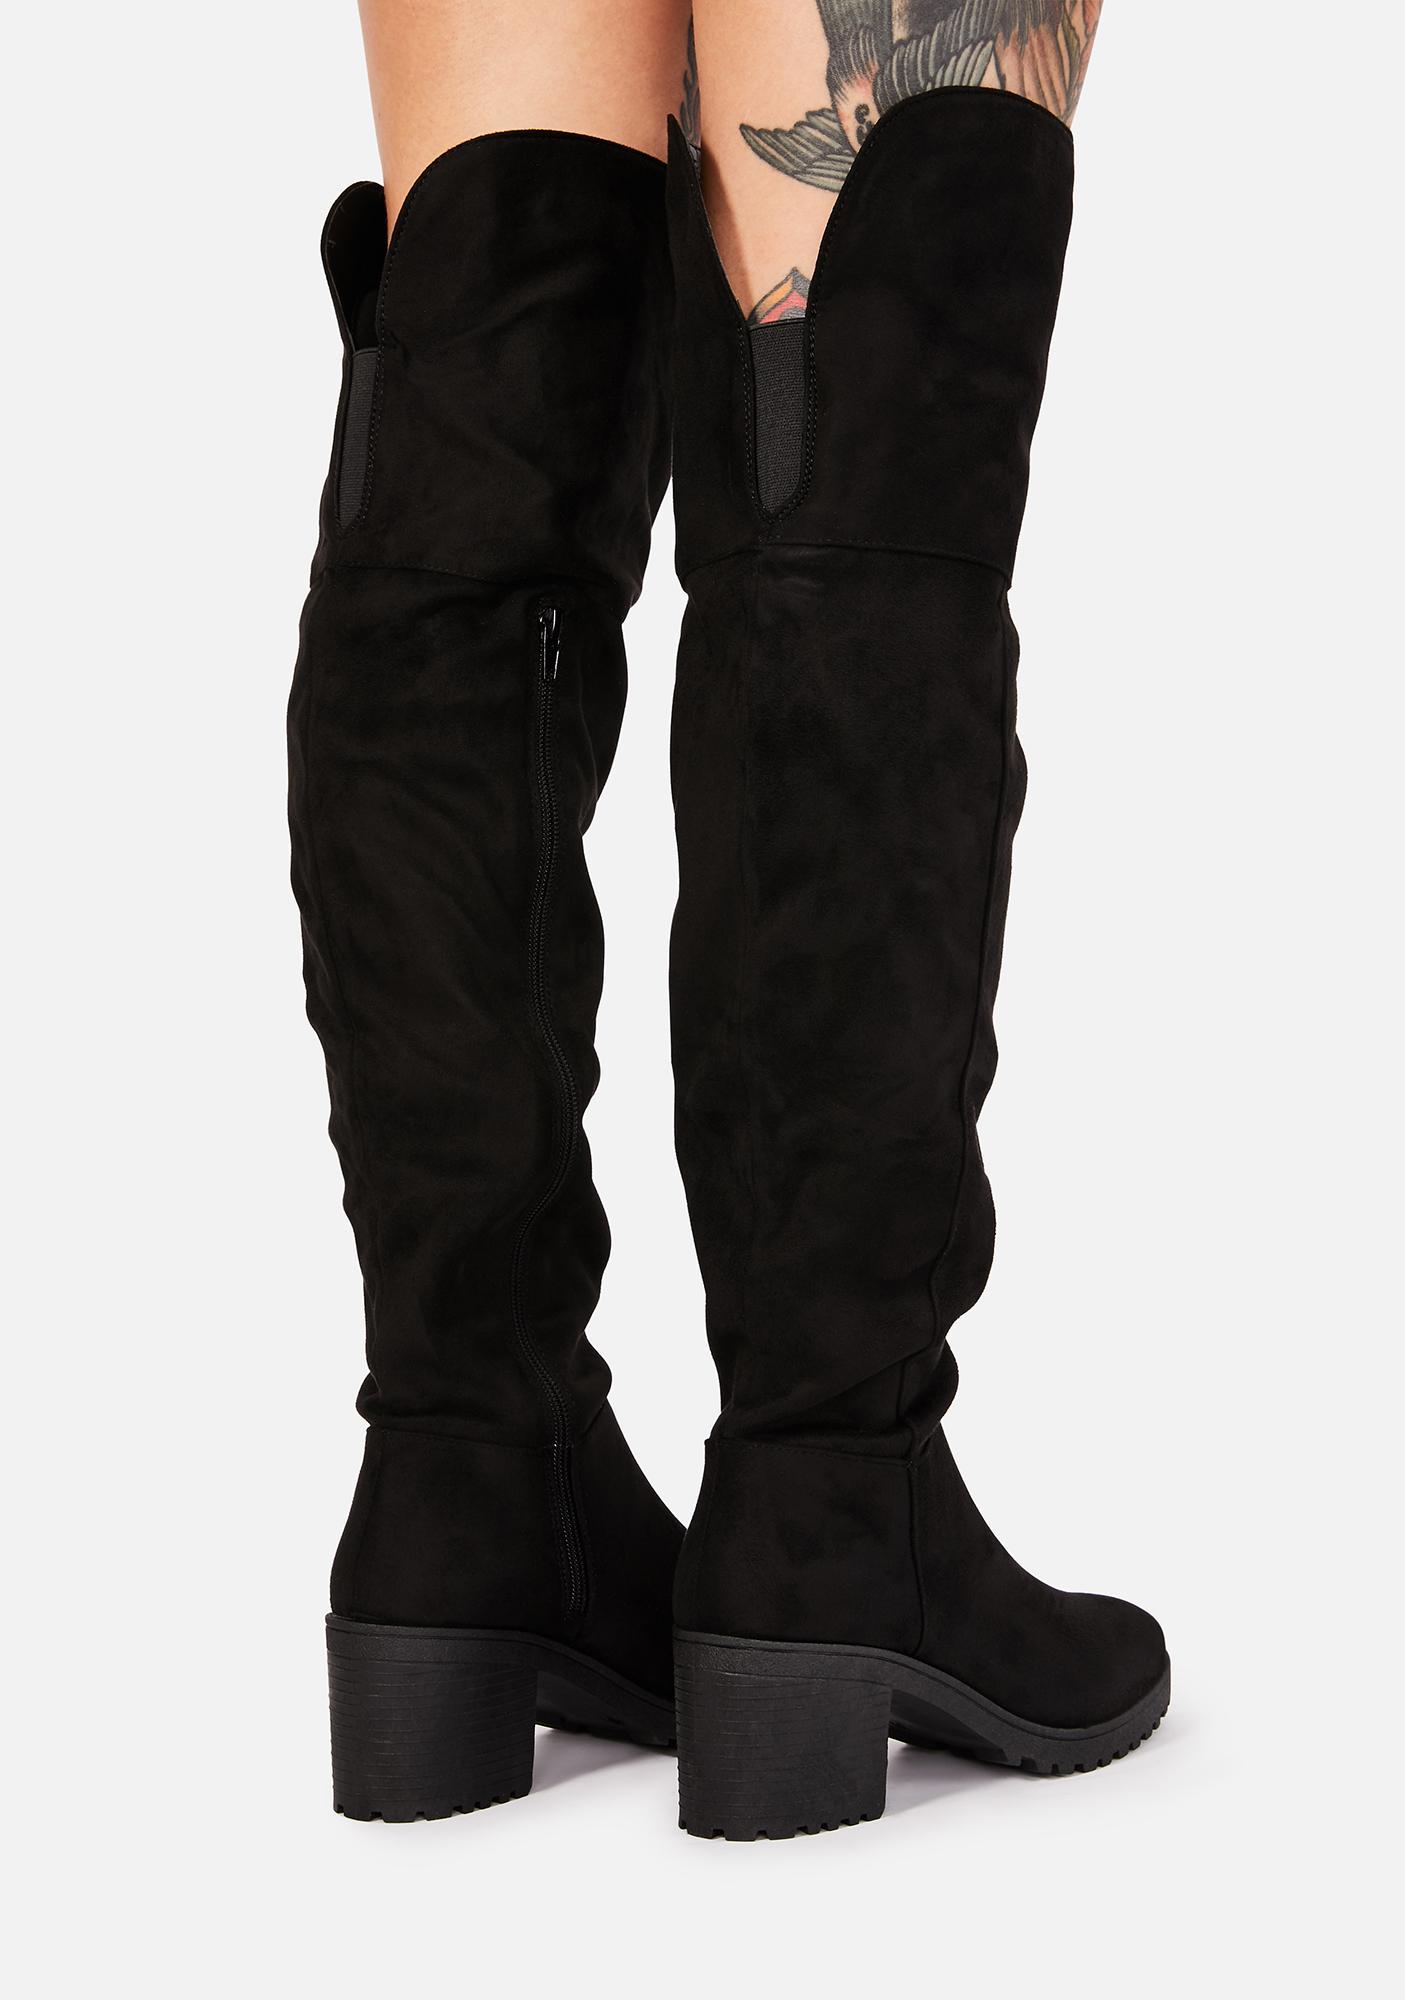 Rude Grl Suede Boots